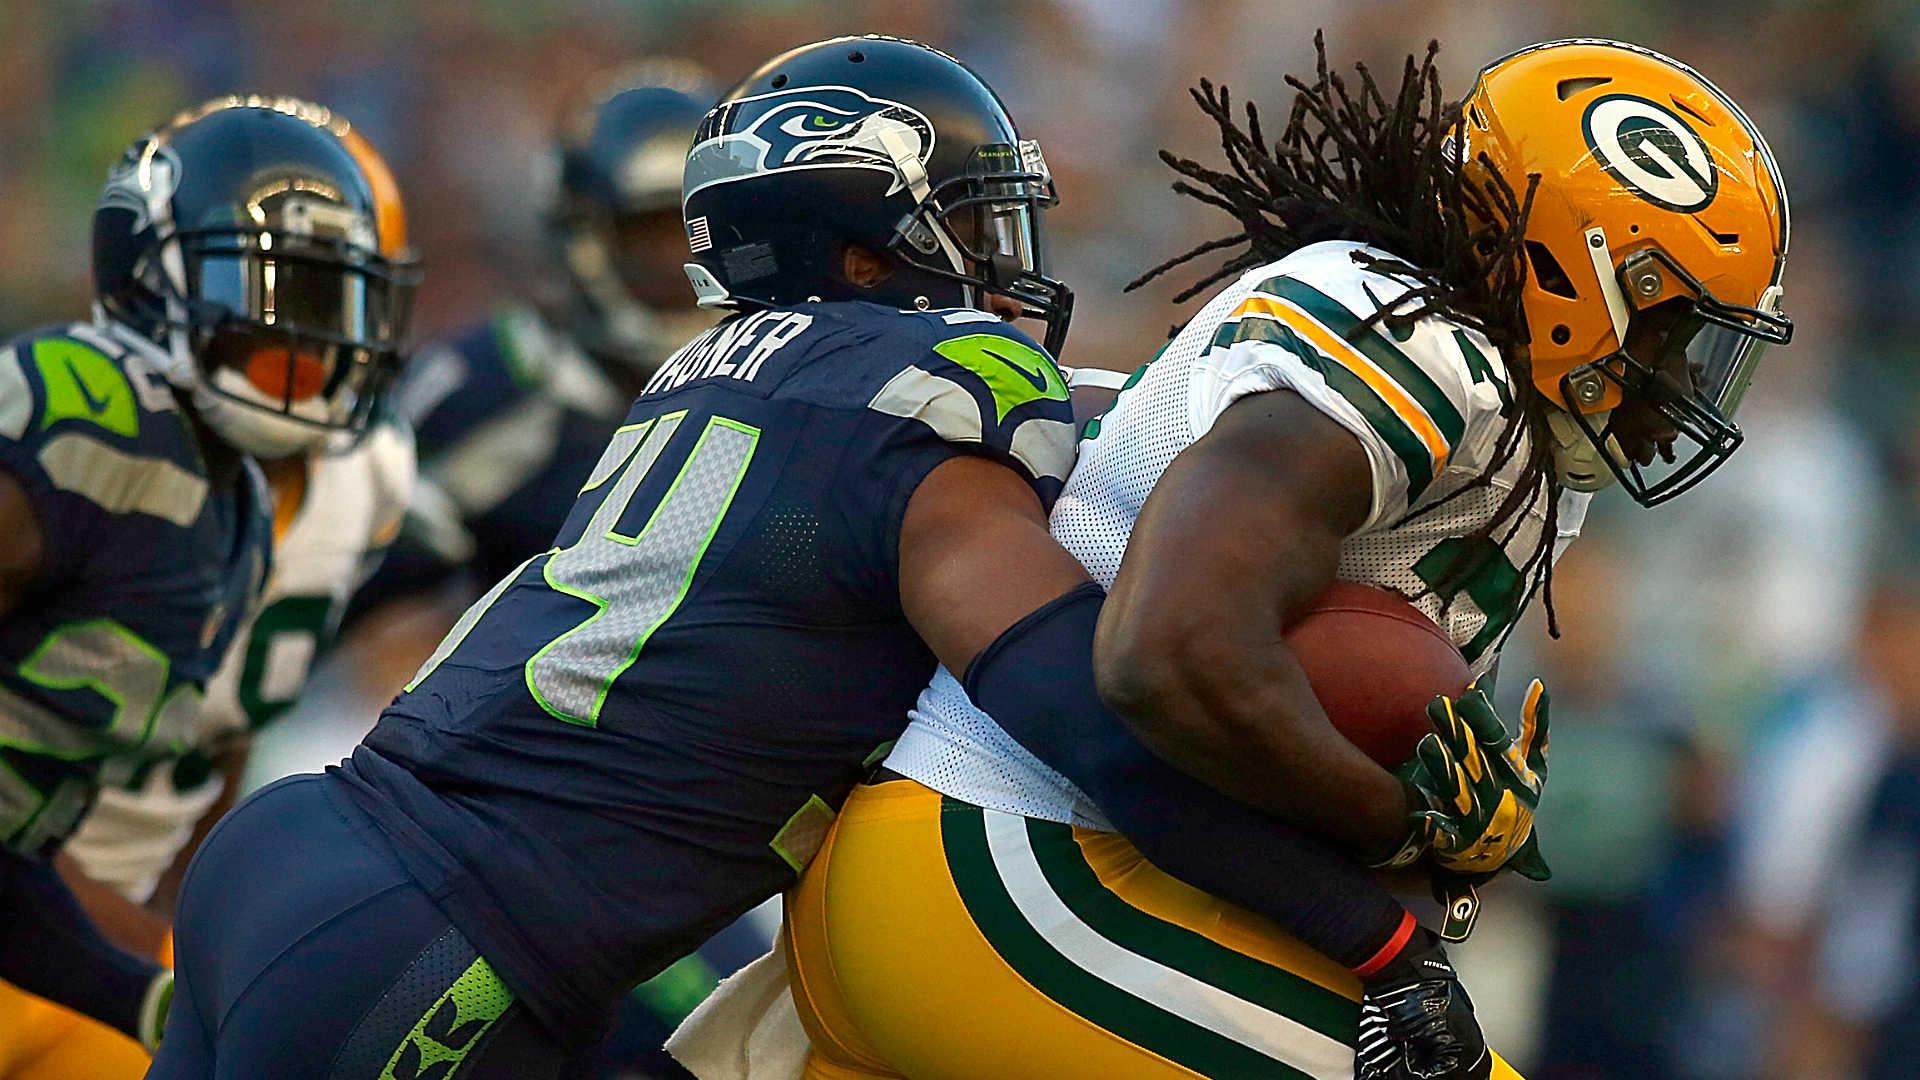 Packers-Seahawks1-090414-Getty-FTR.jpg